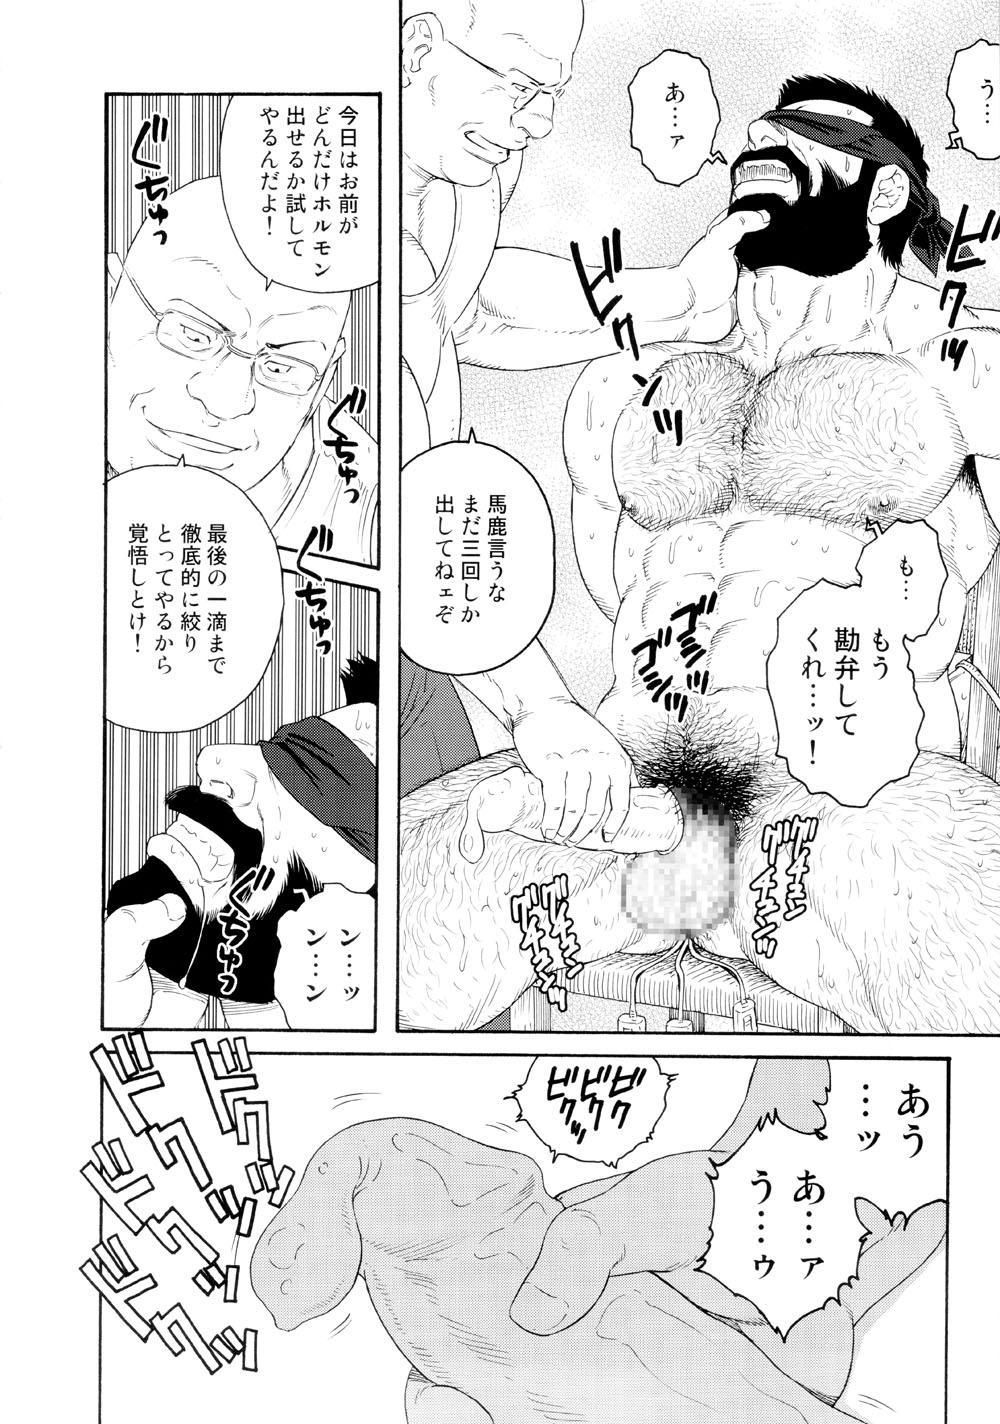 Genryu Chapter 3 13